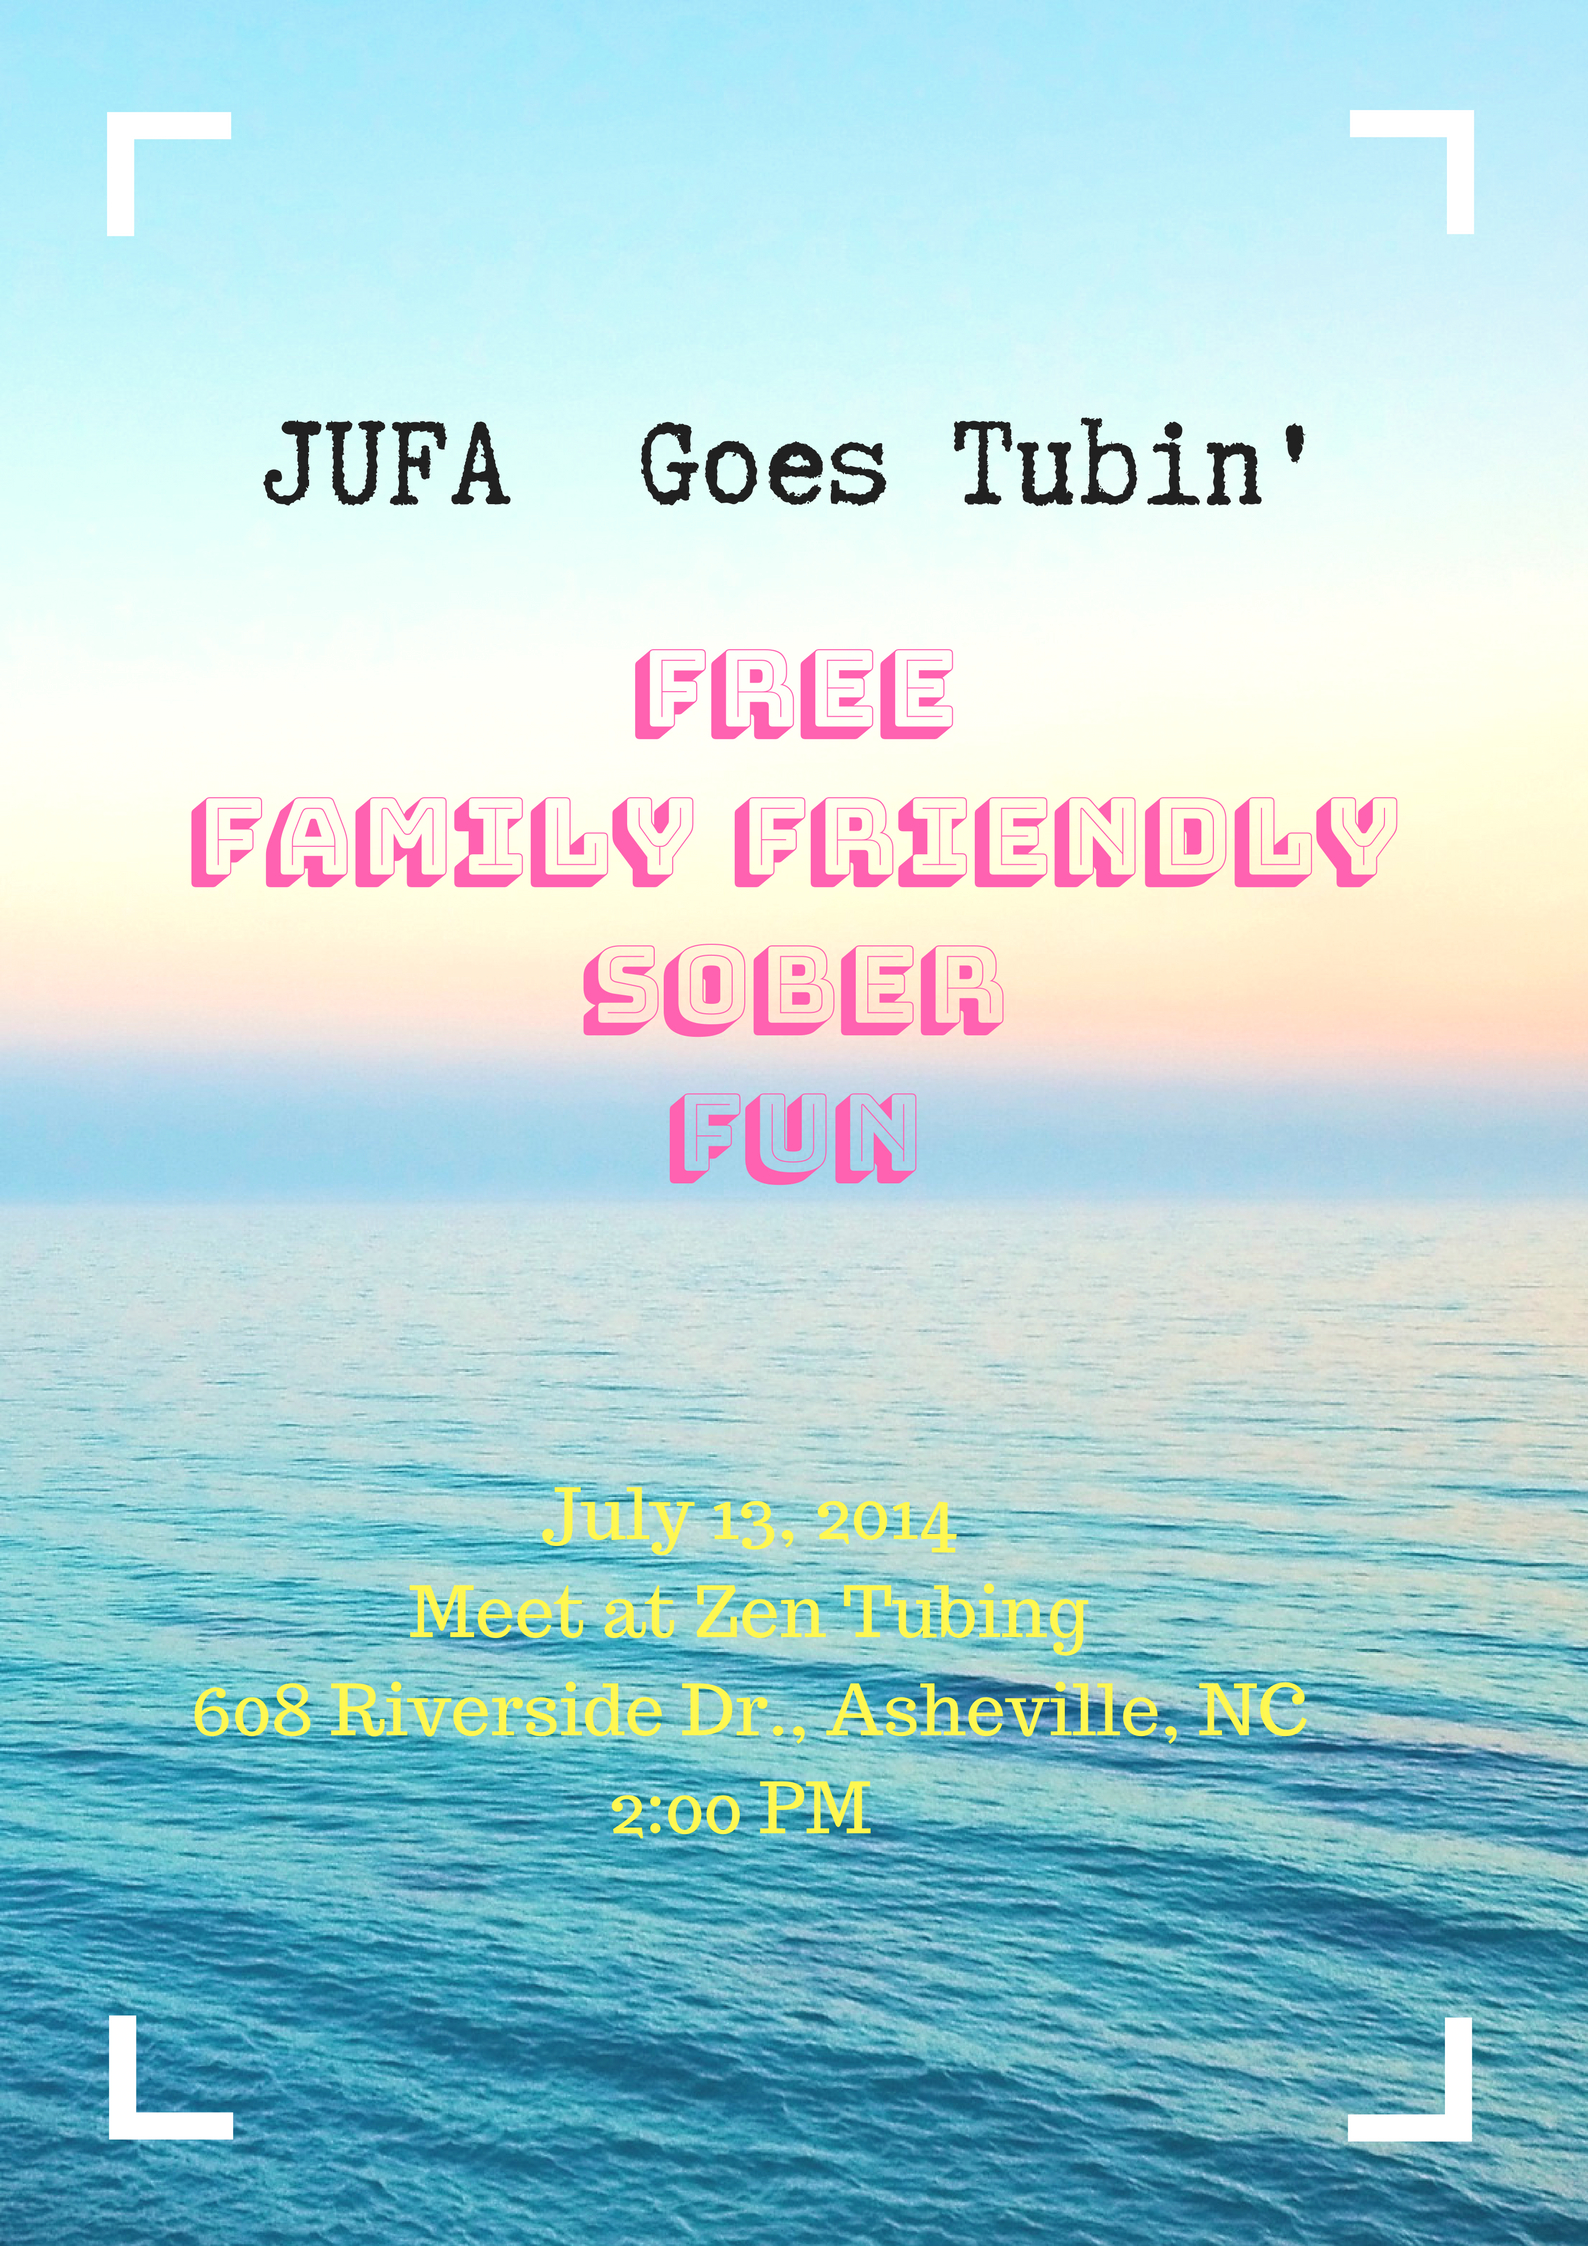 JUFA Goes Tubin'.jpg